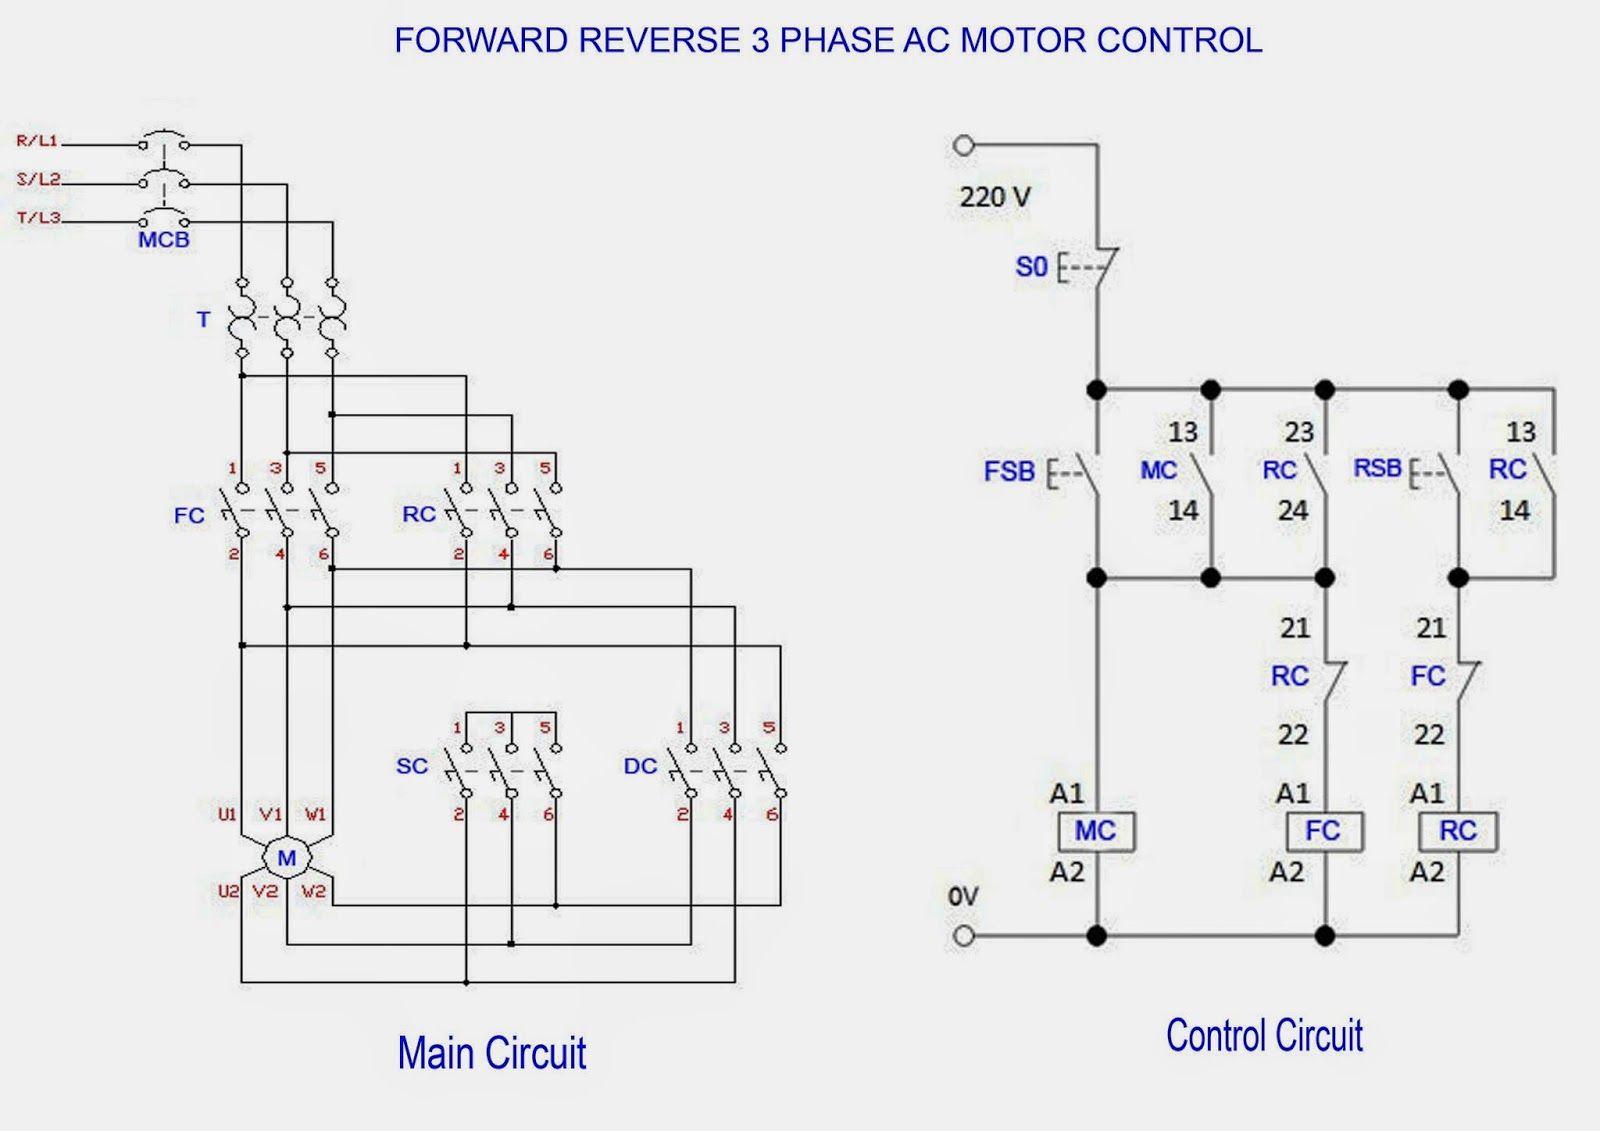 forward reverse 3 phase ac motor control wiring diagram [ 1600 x 1131 Pixel ]